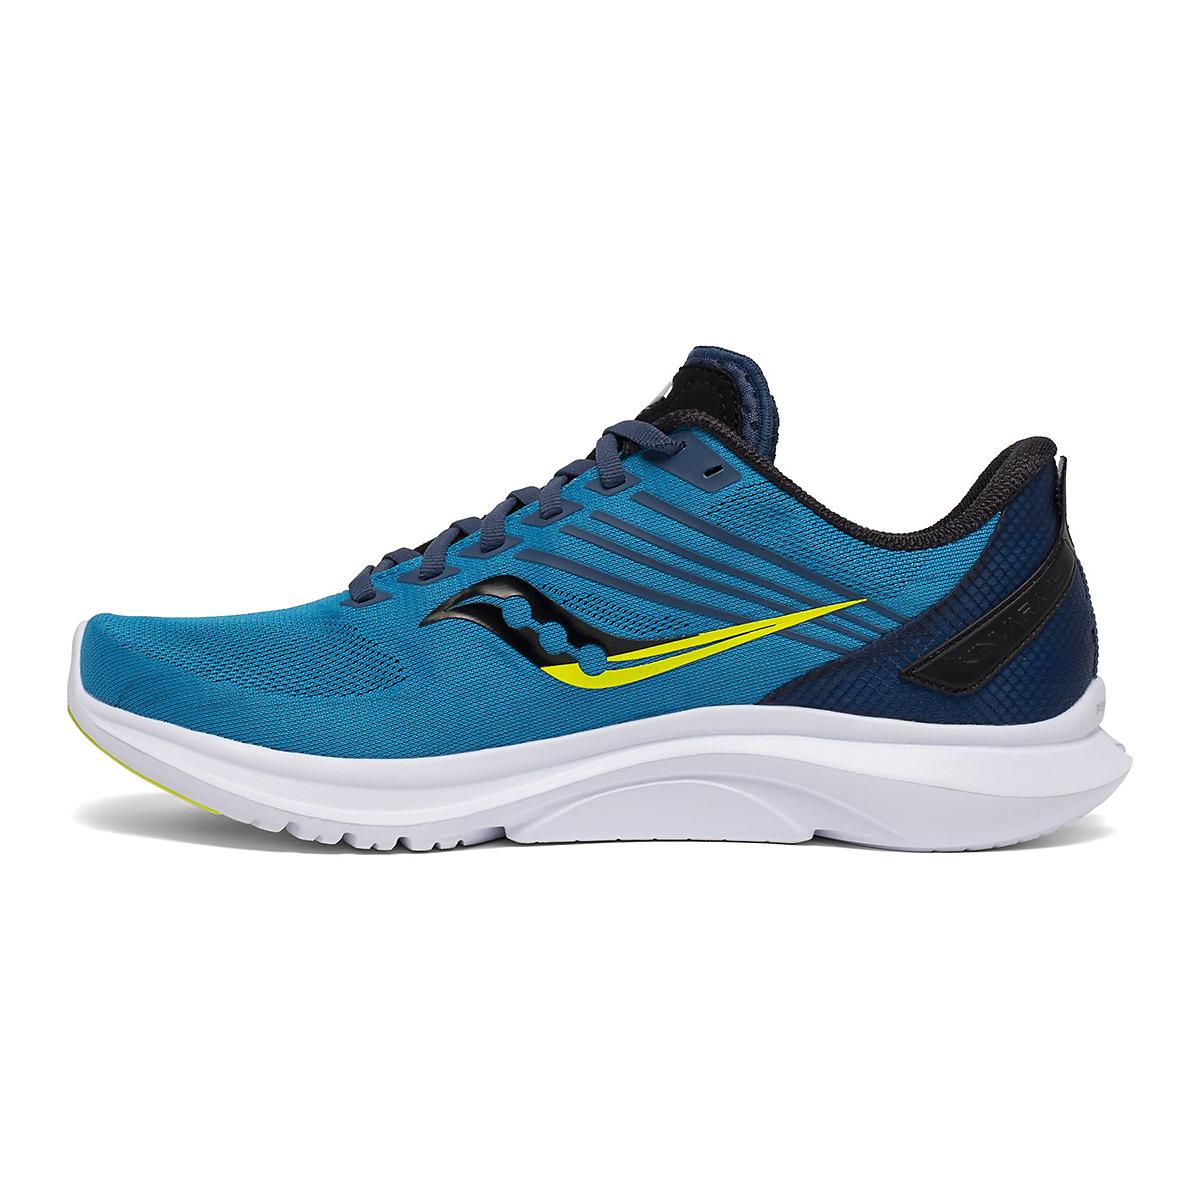 Men's Saucony Kinvara 12 Running Shoe - Color: Cobalt/Citrus - Size: 7 - Width: Regular, Cobalt/Citrus, large, image 2